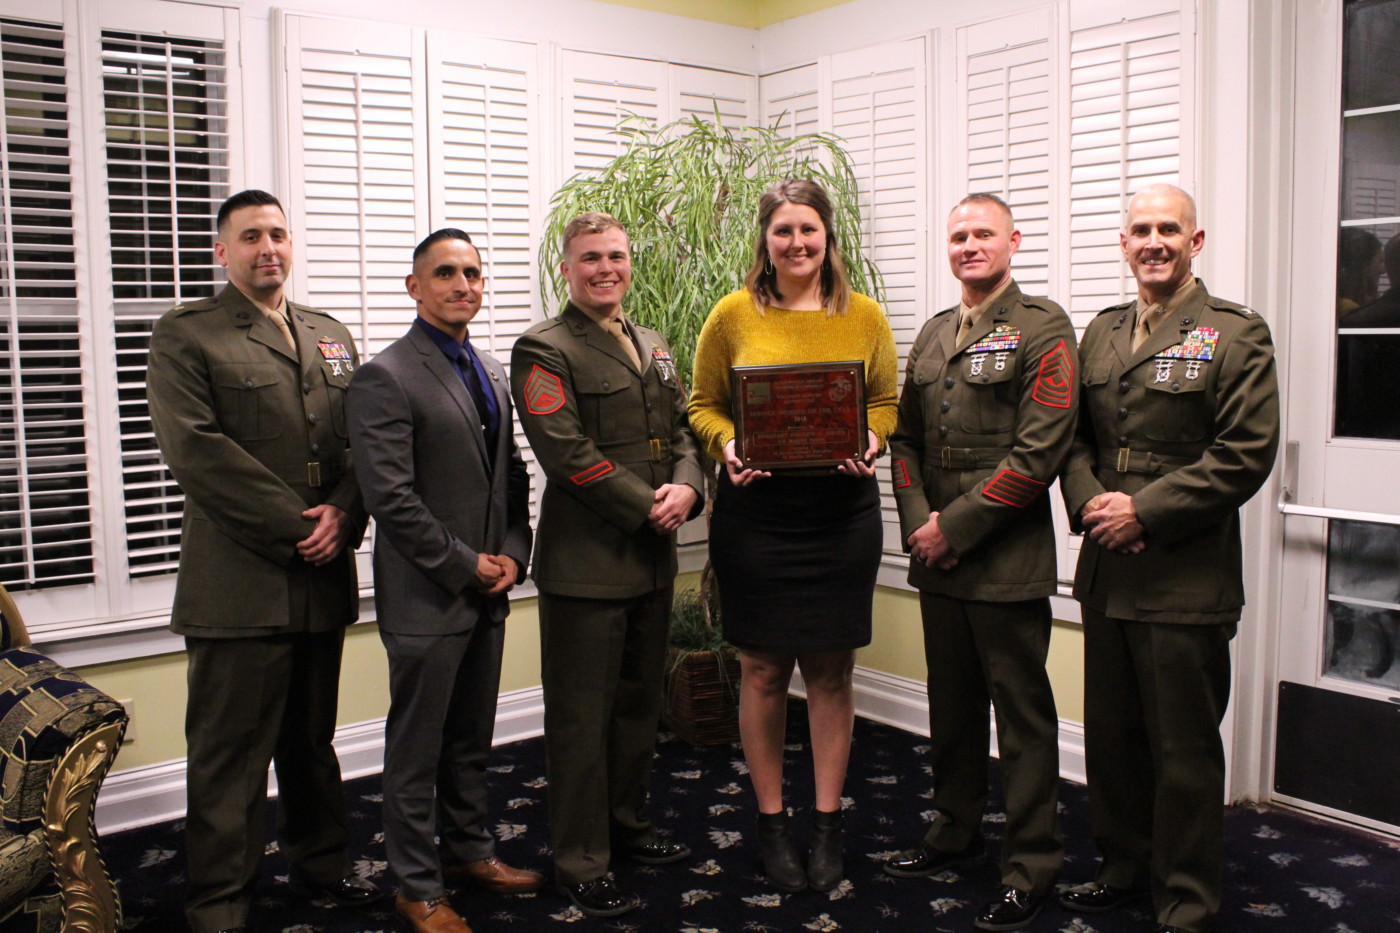 Service Member of the Year - SSgt Daniel Macias, USMC